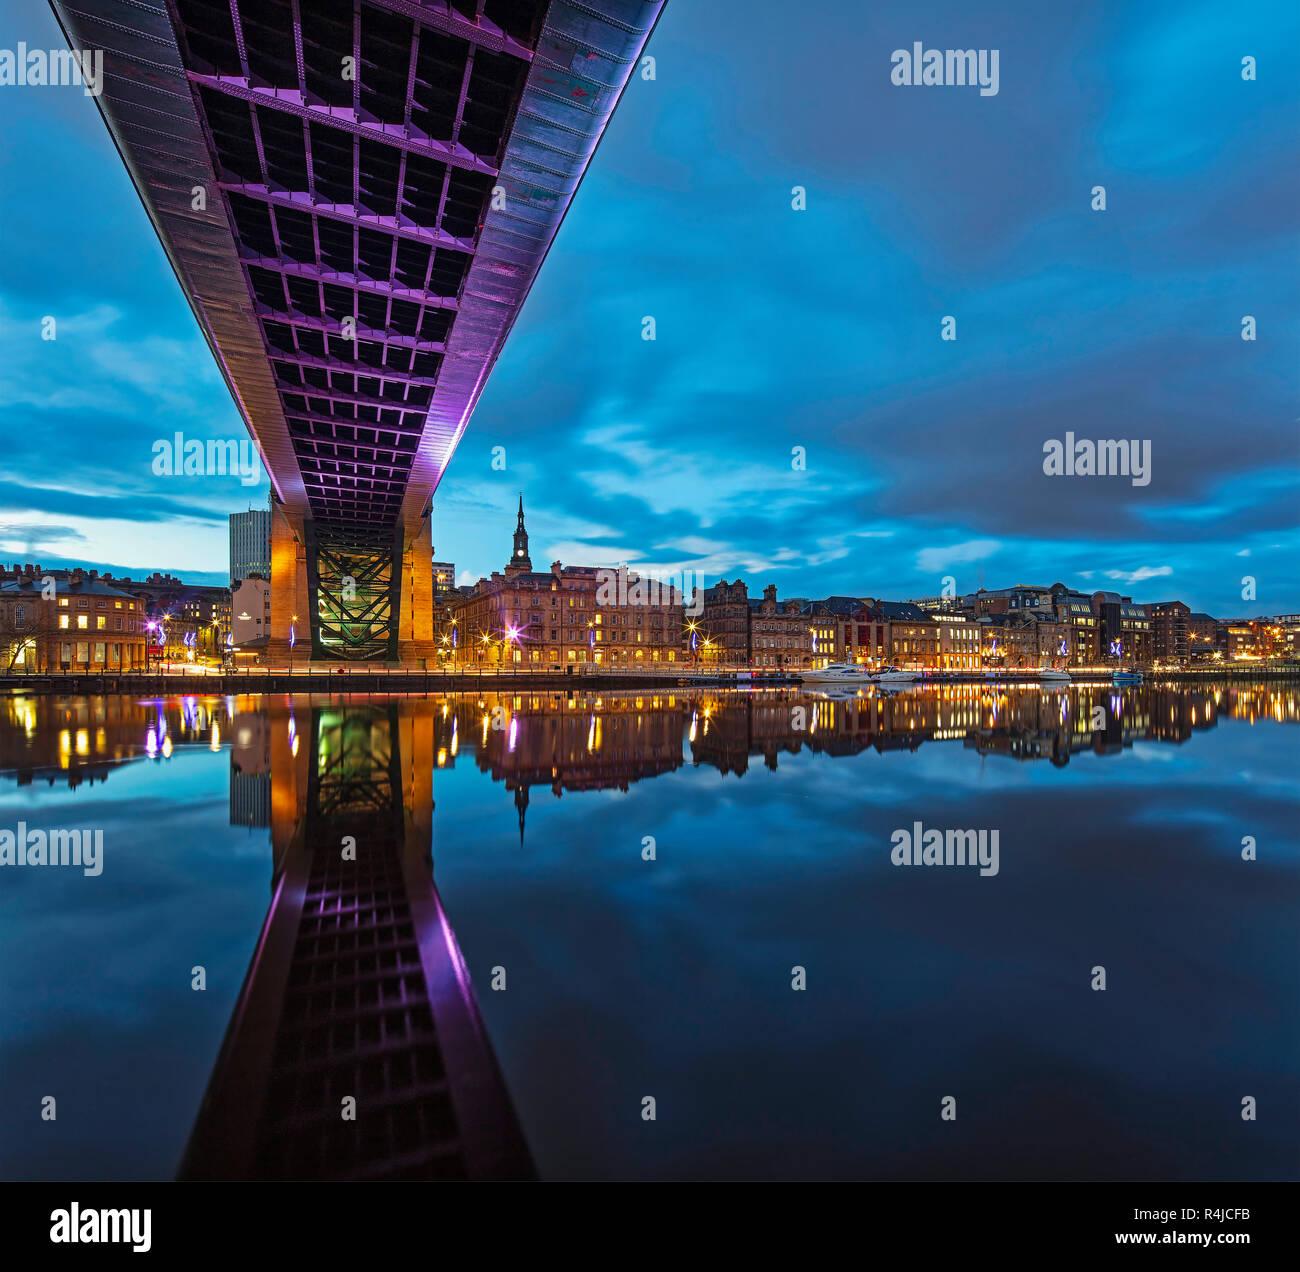 Reflections along Newcastle quayside at twilight, Newcastle upon Tyne, Tyne & Wear, England, United Kingdom Stock Photo